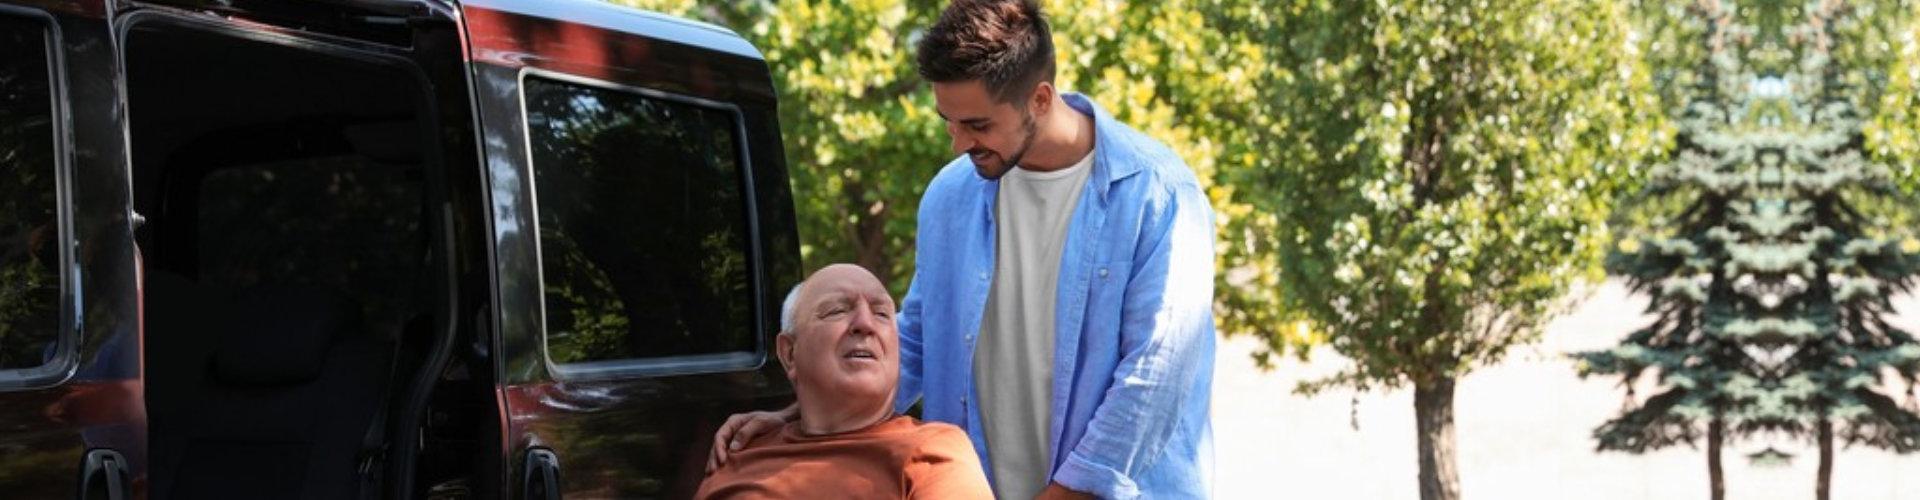 senior man with his male caregiver